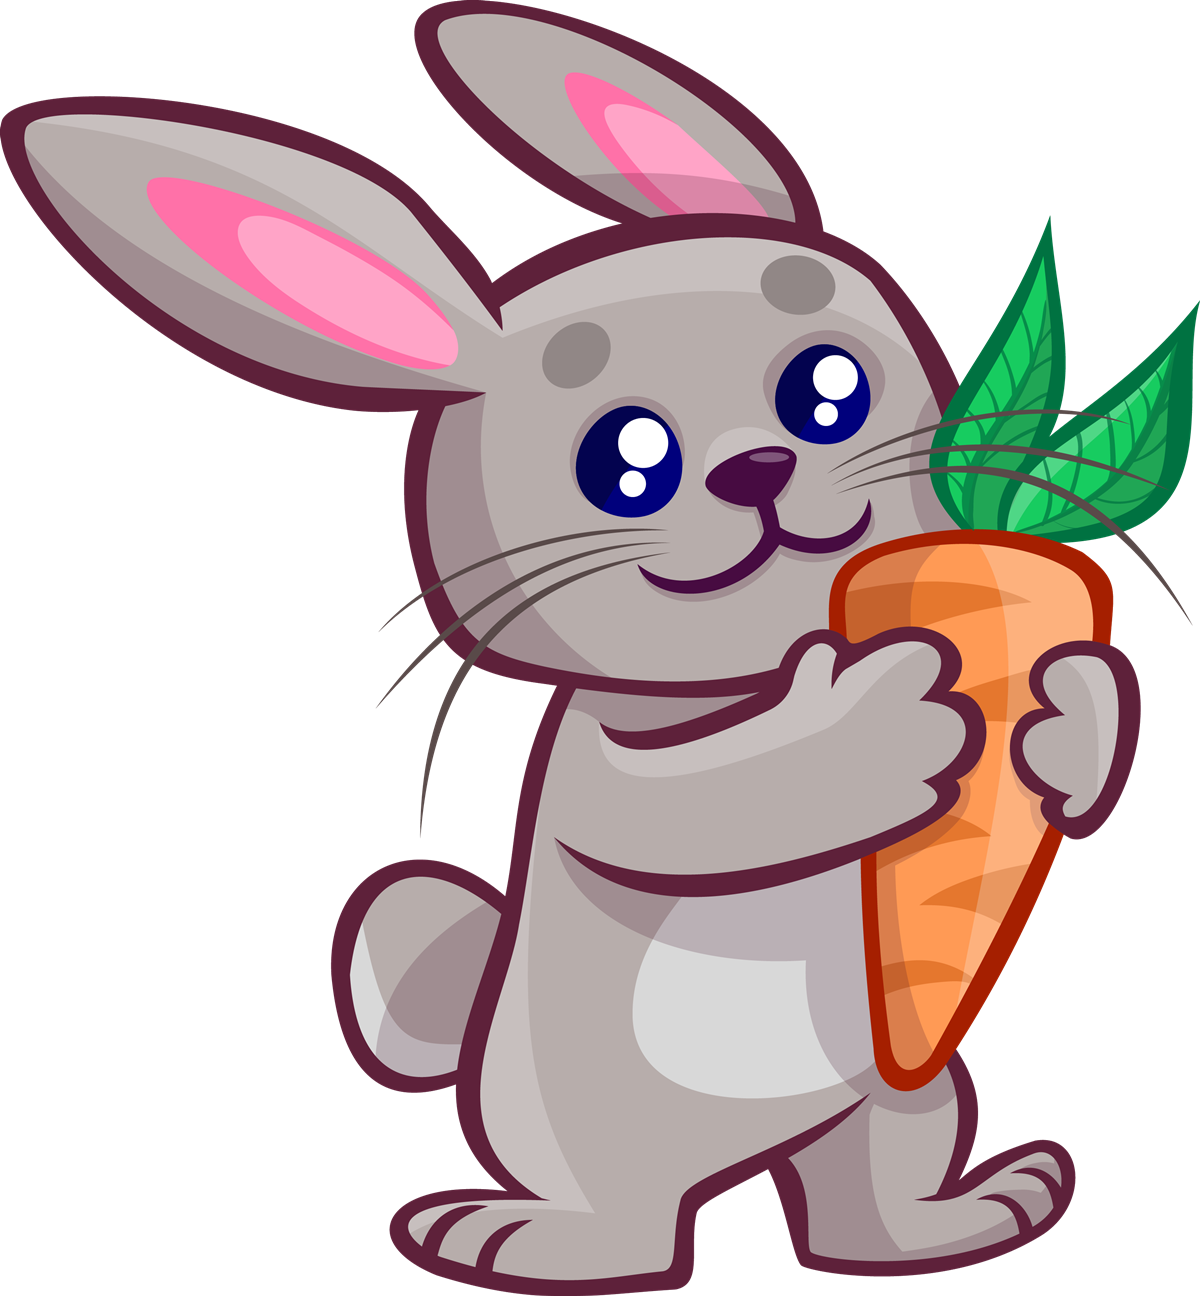 Cool clipart bunny. Imagination cartoon pic free